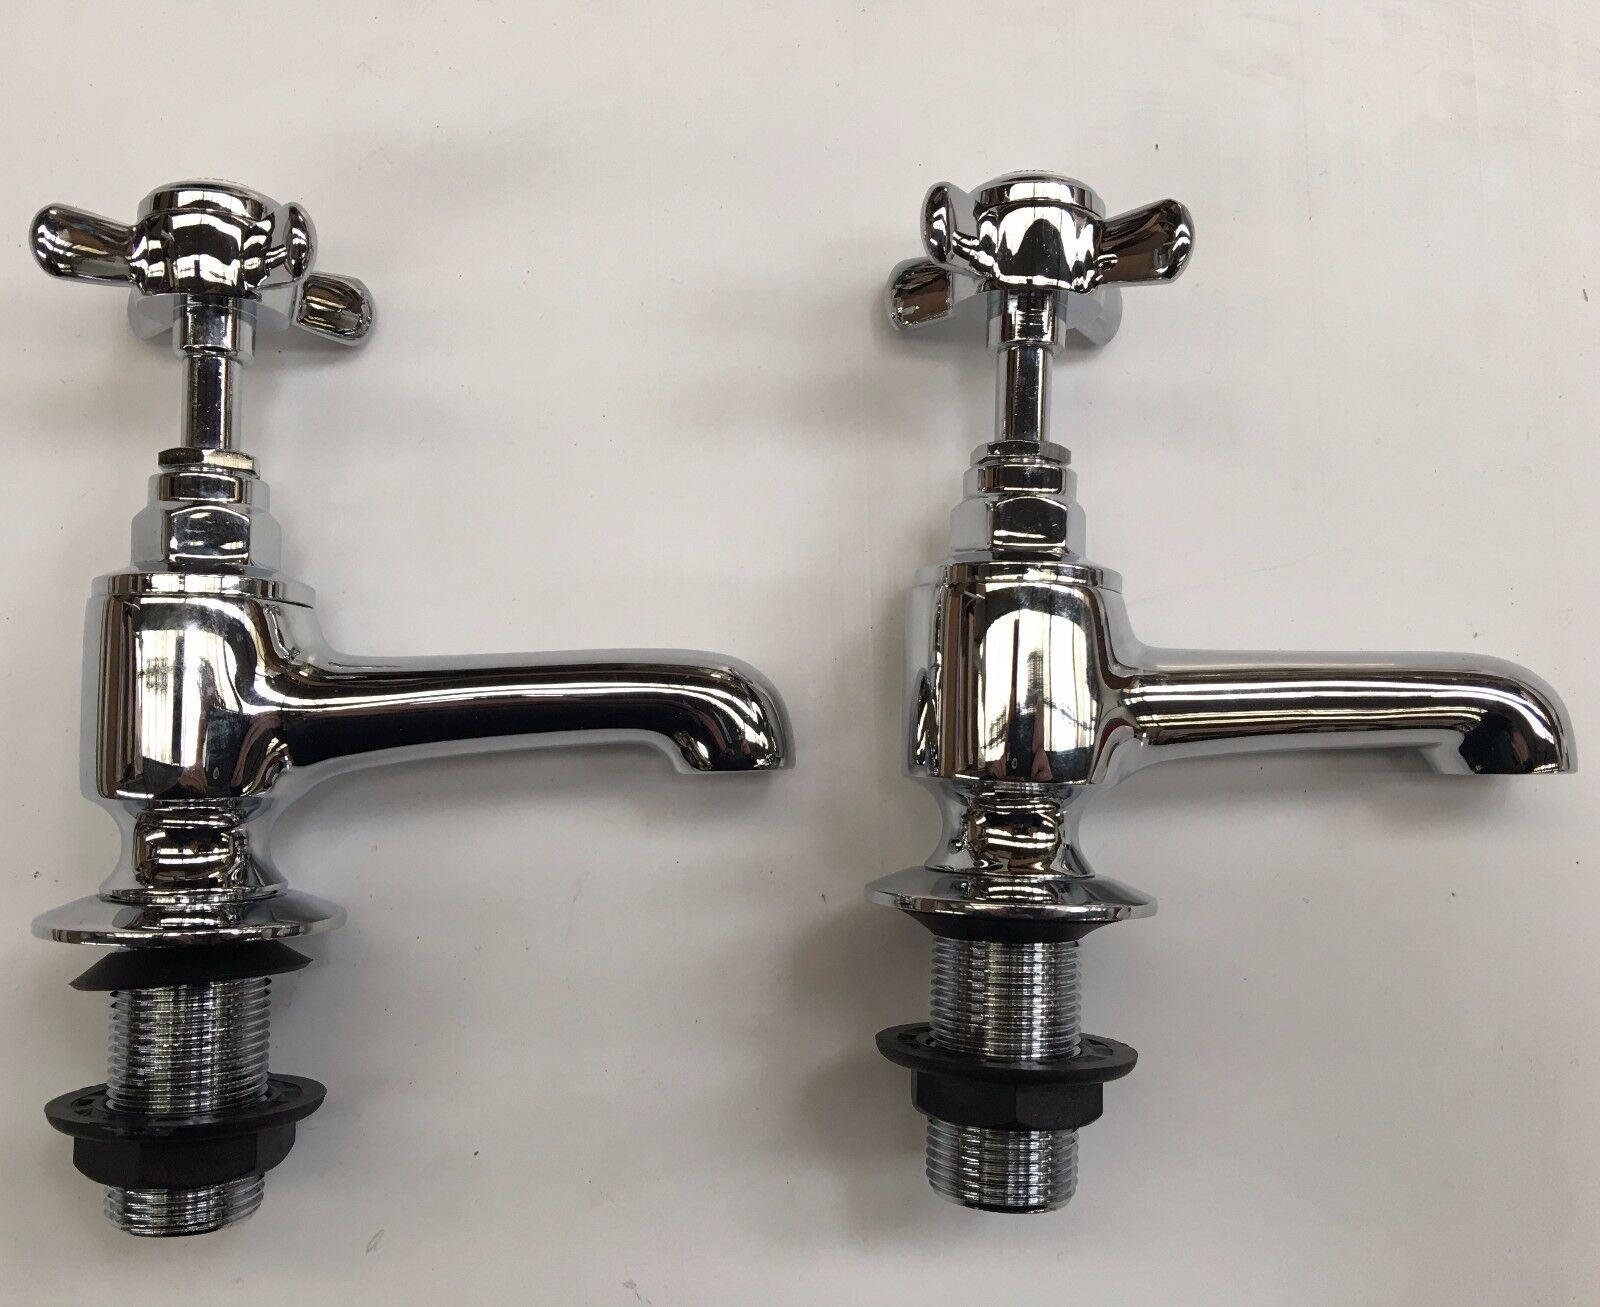 Details about CG Chrome Bath Single Lever Double Bloc Mixer Filler Low 2TH Tap Heritage Cross